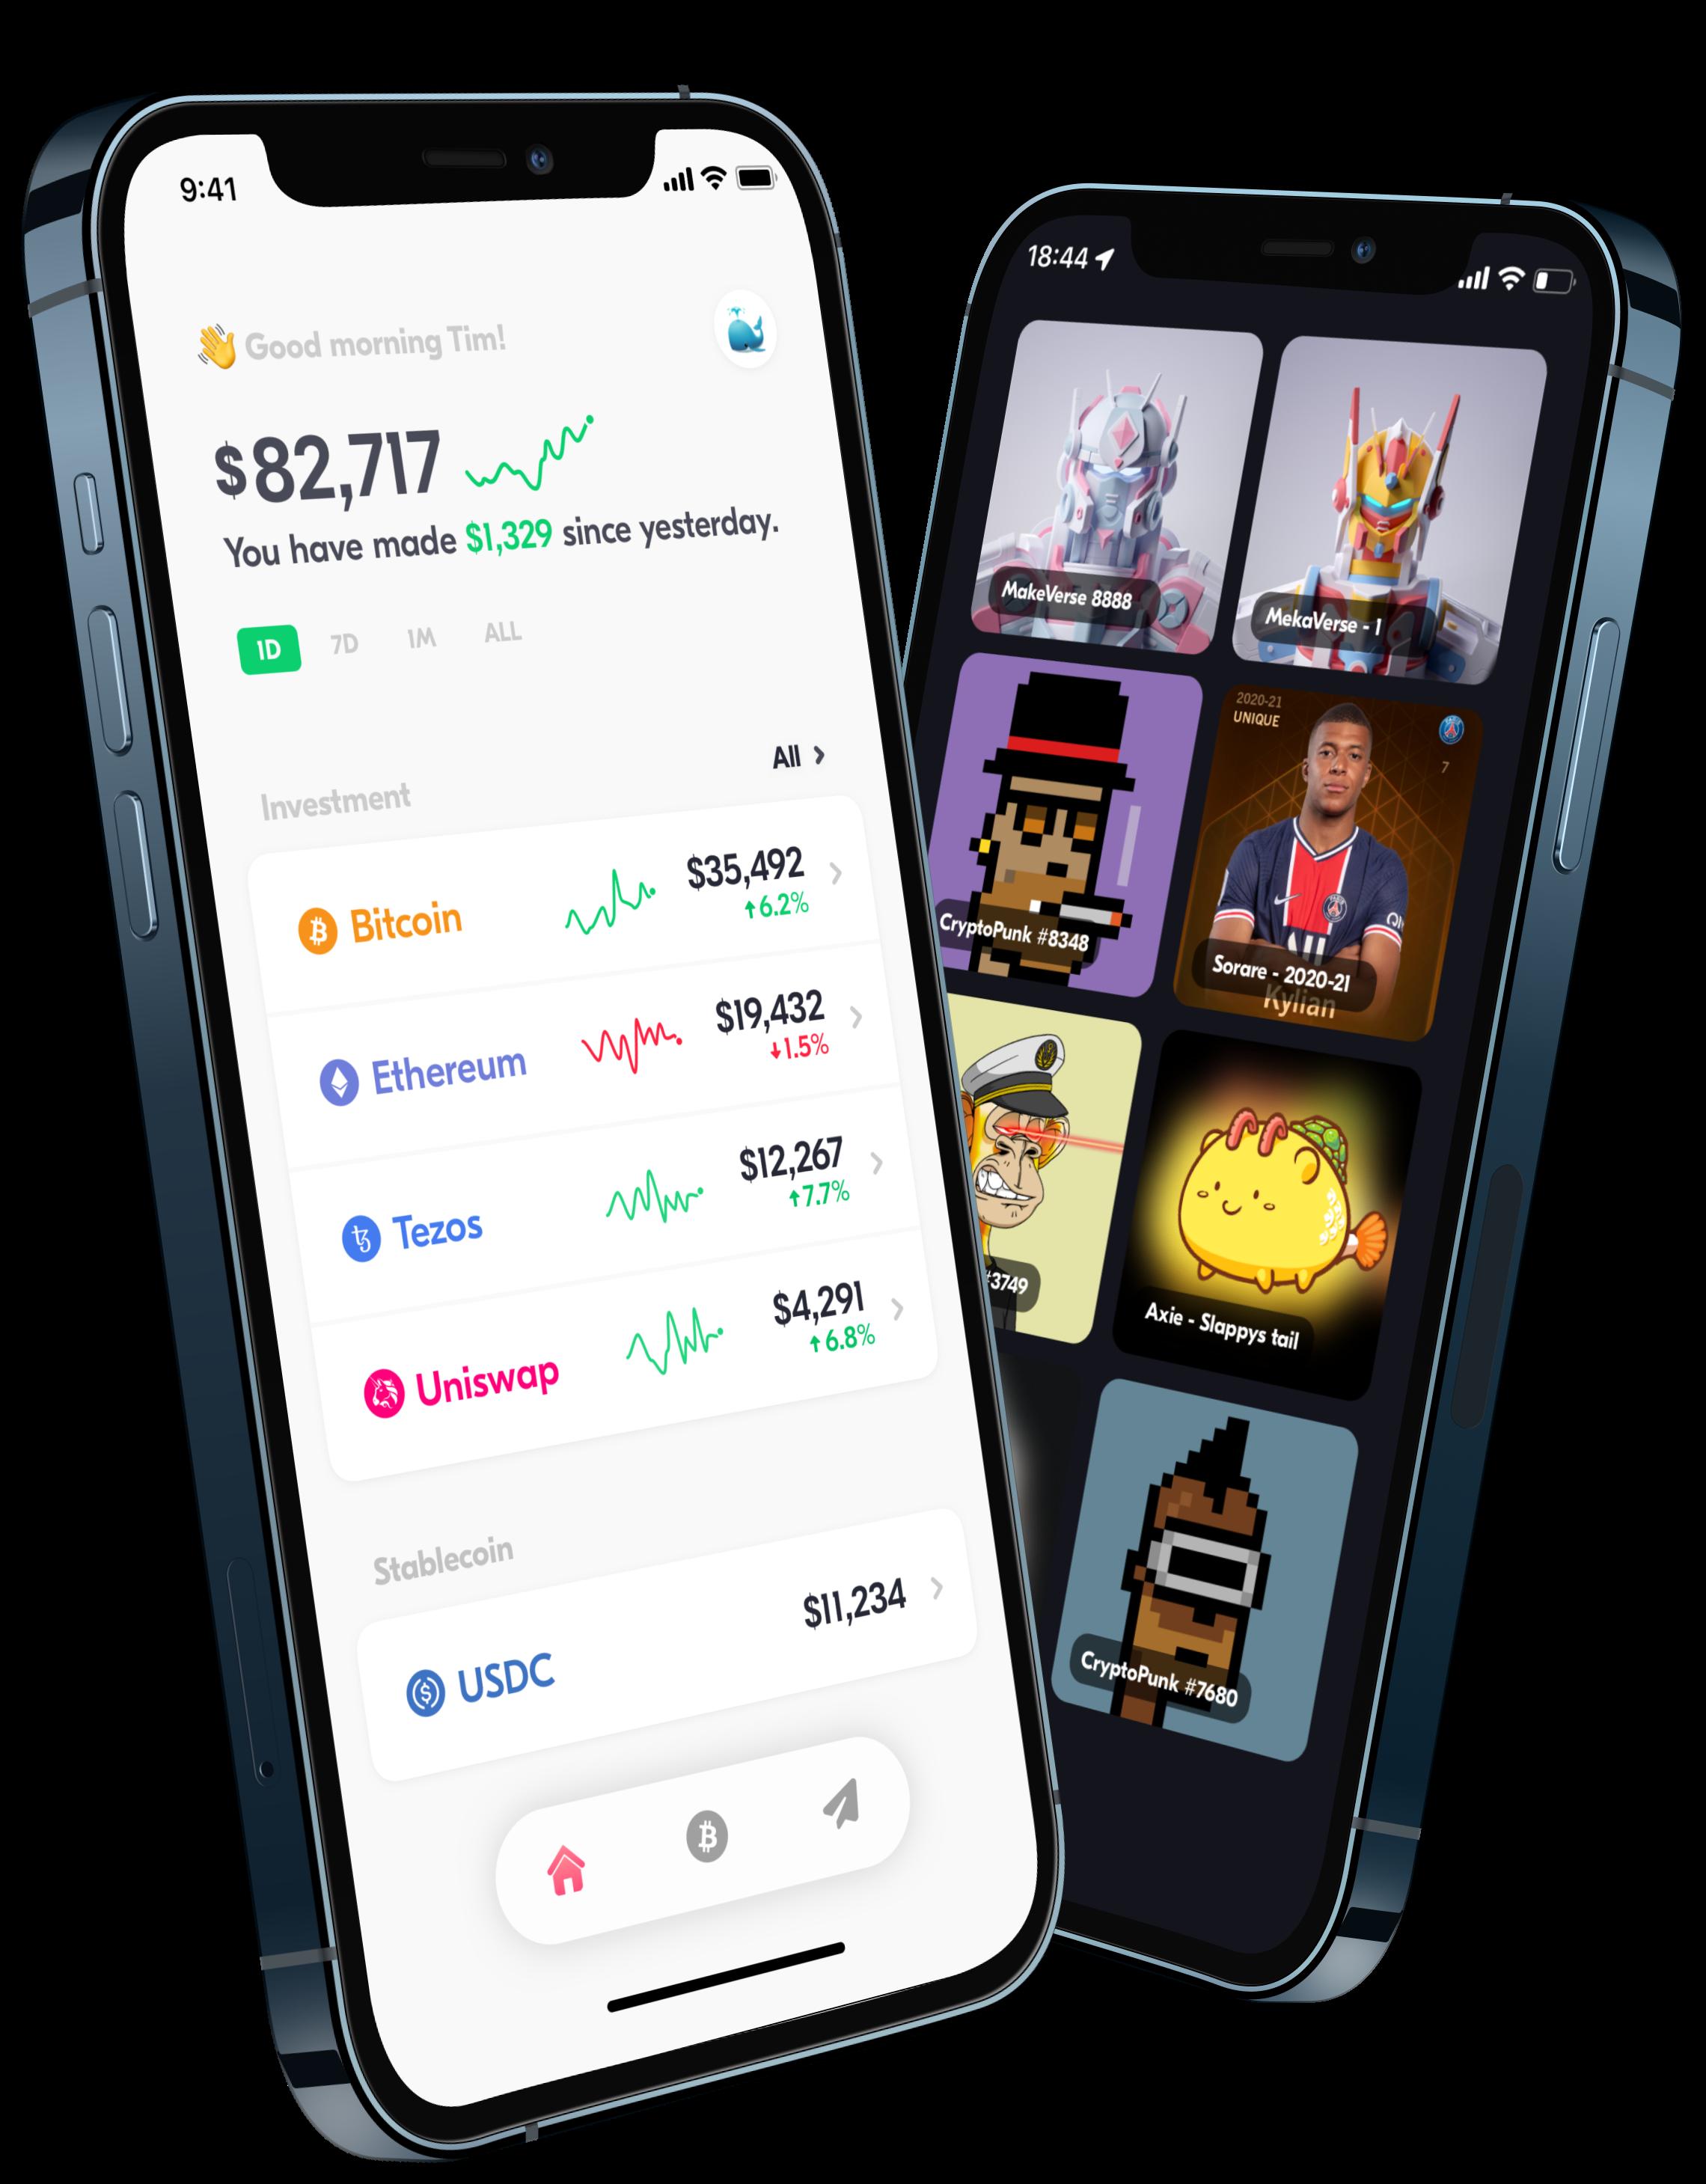 Spot wallet NFT, Bitcoin, Ethereum, Tezos